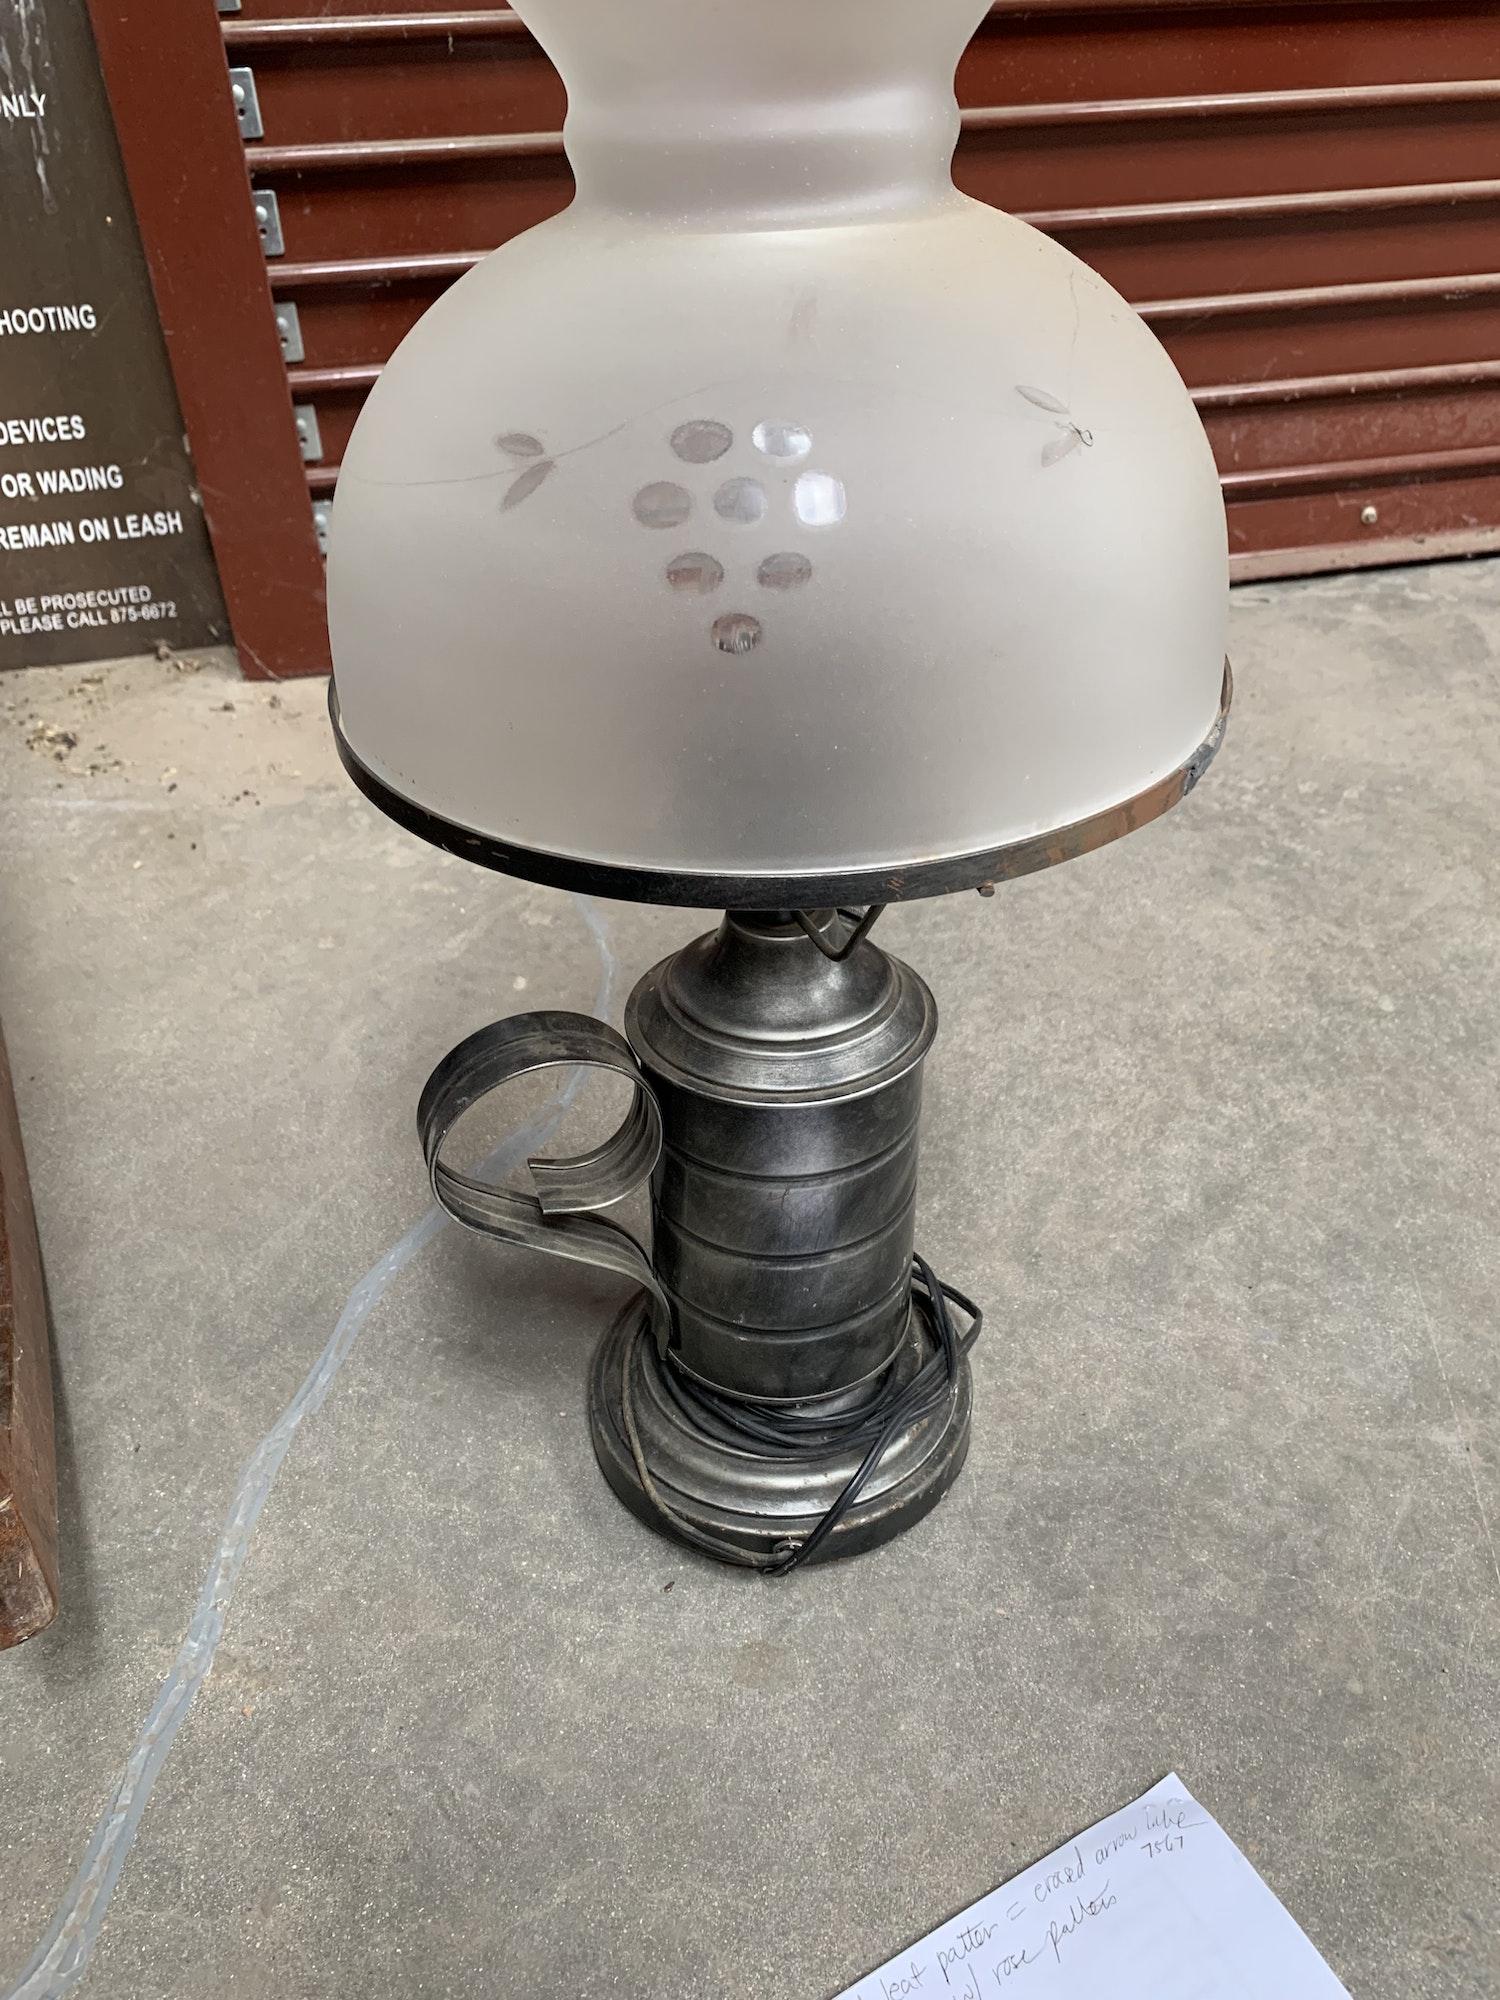 May contain: lamp